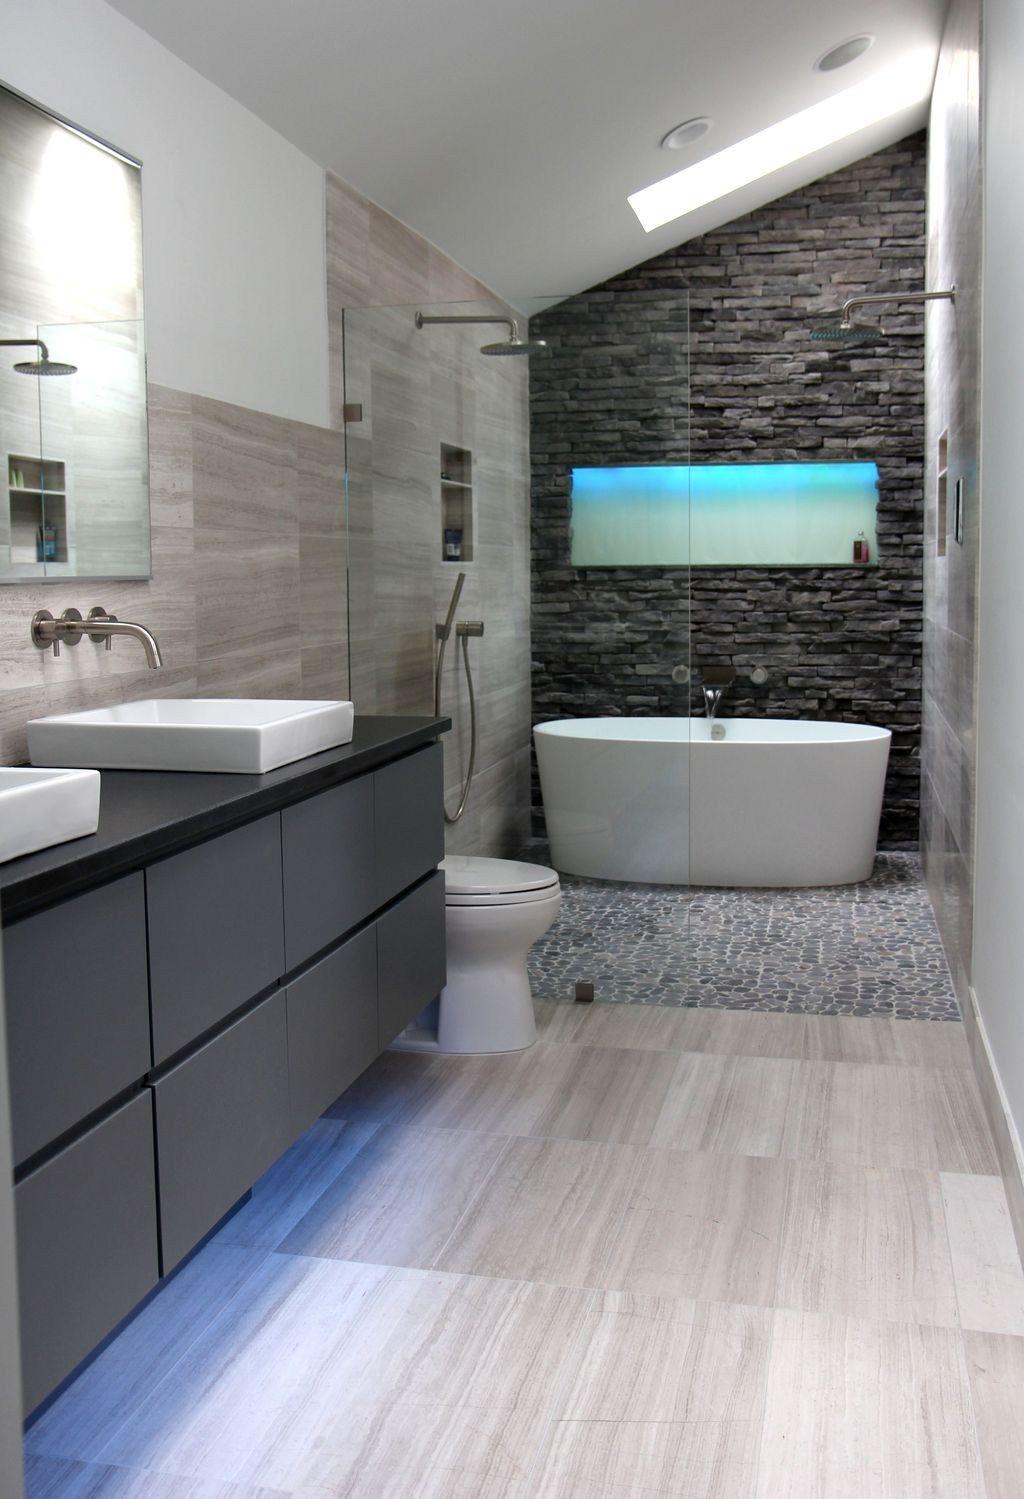 44 Popular Modern Contemporary Bathroom Design Ideas To Make Luxurious Look Trendehouse Modern Master Bathroom Luxury Master Bathrooms Bathroom Remodel Master